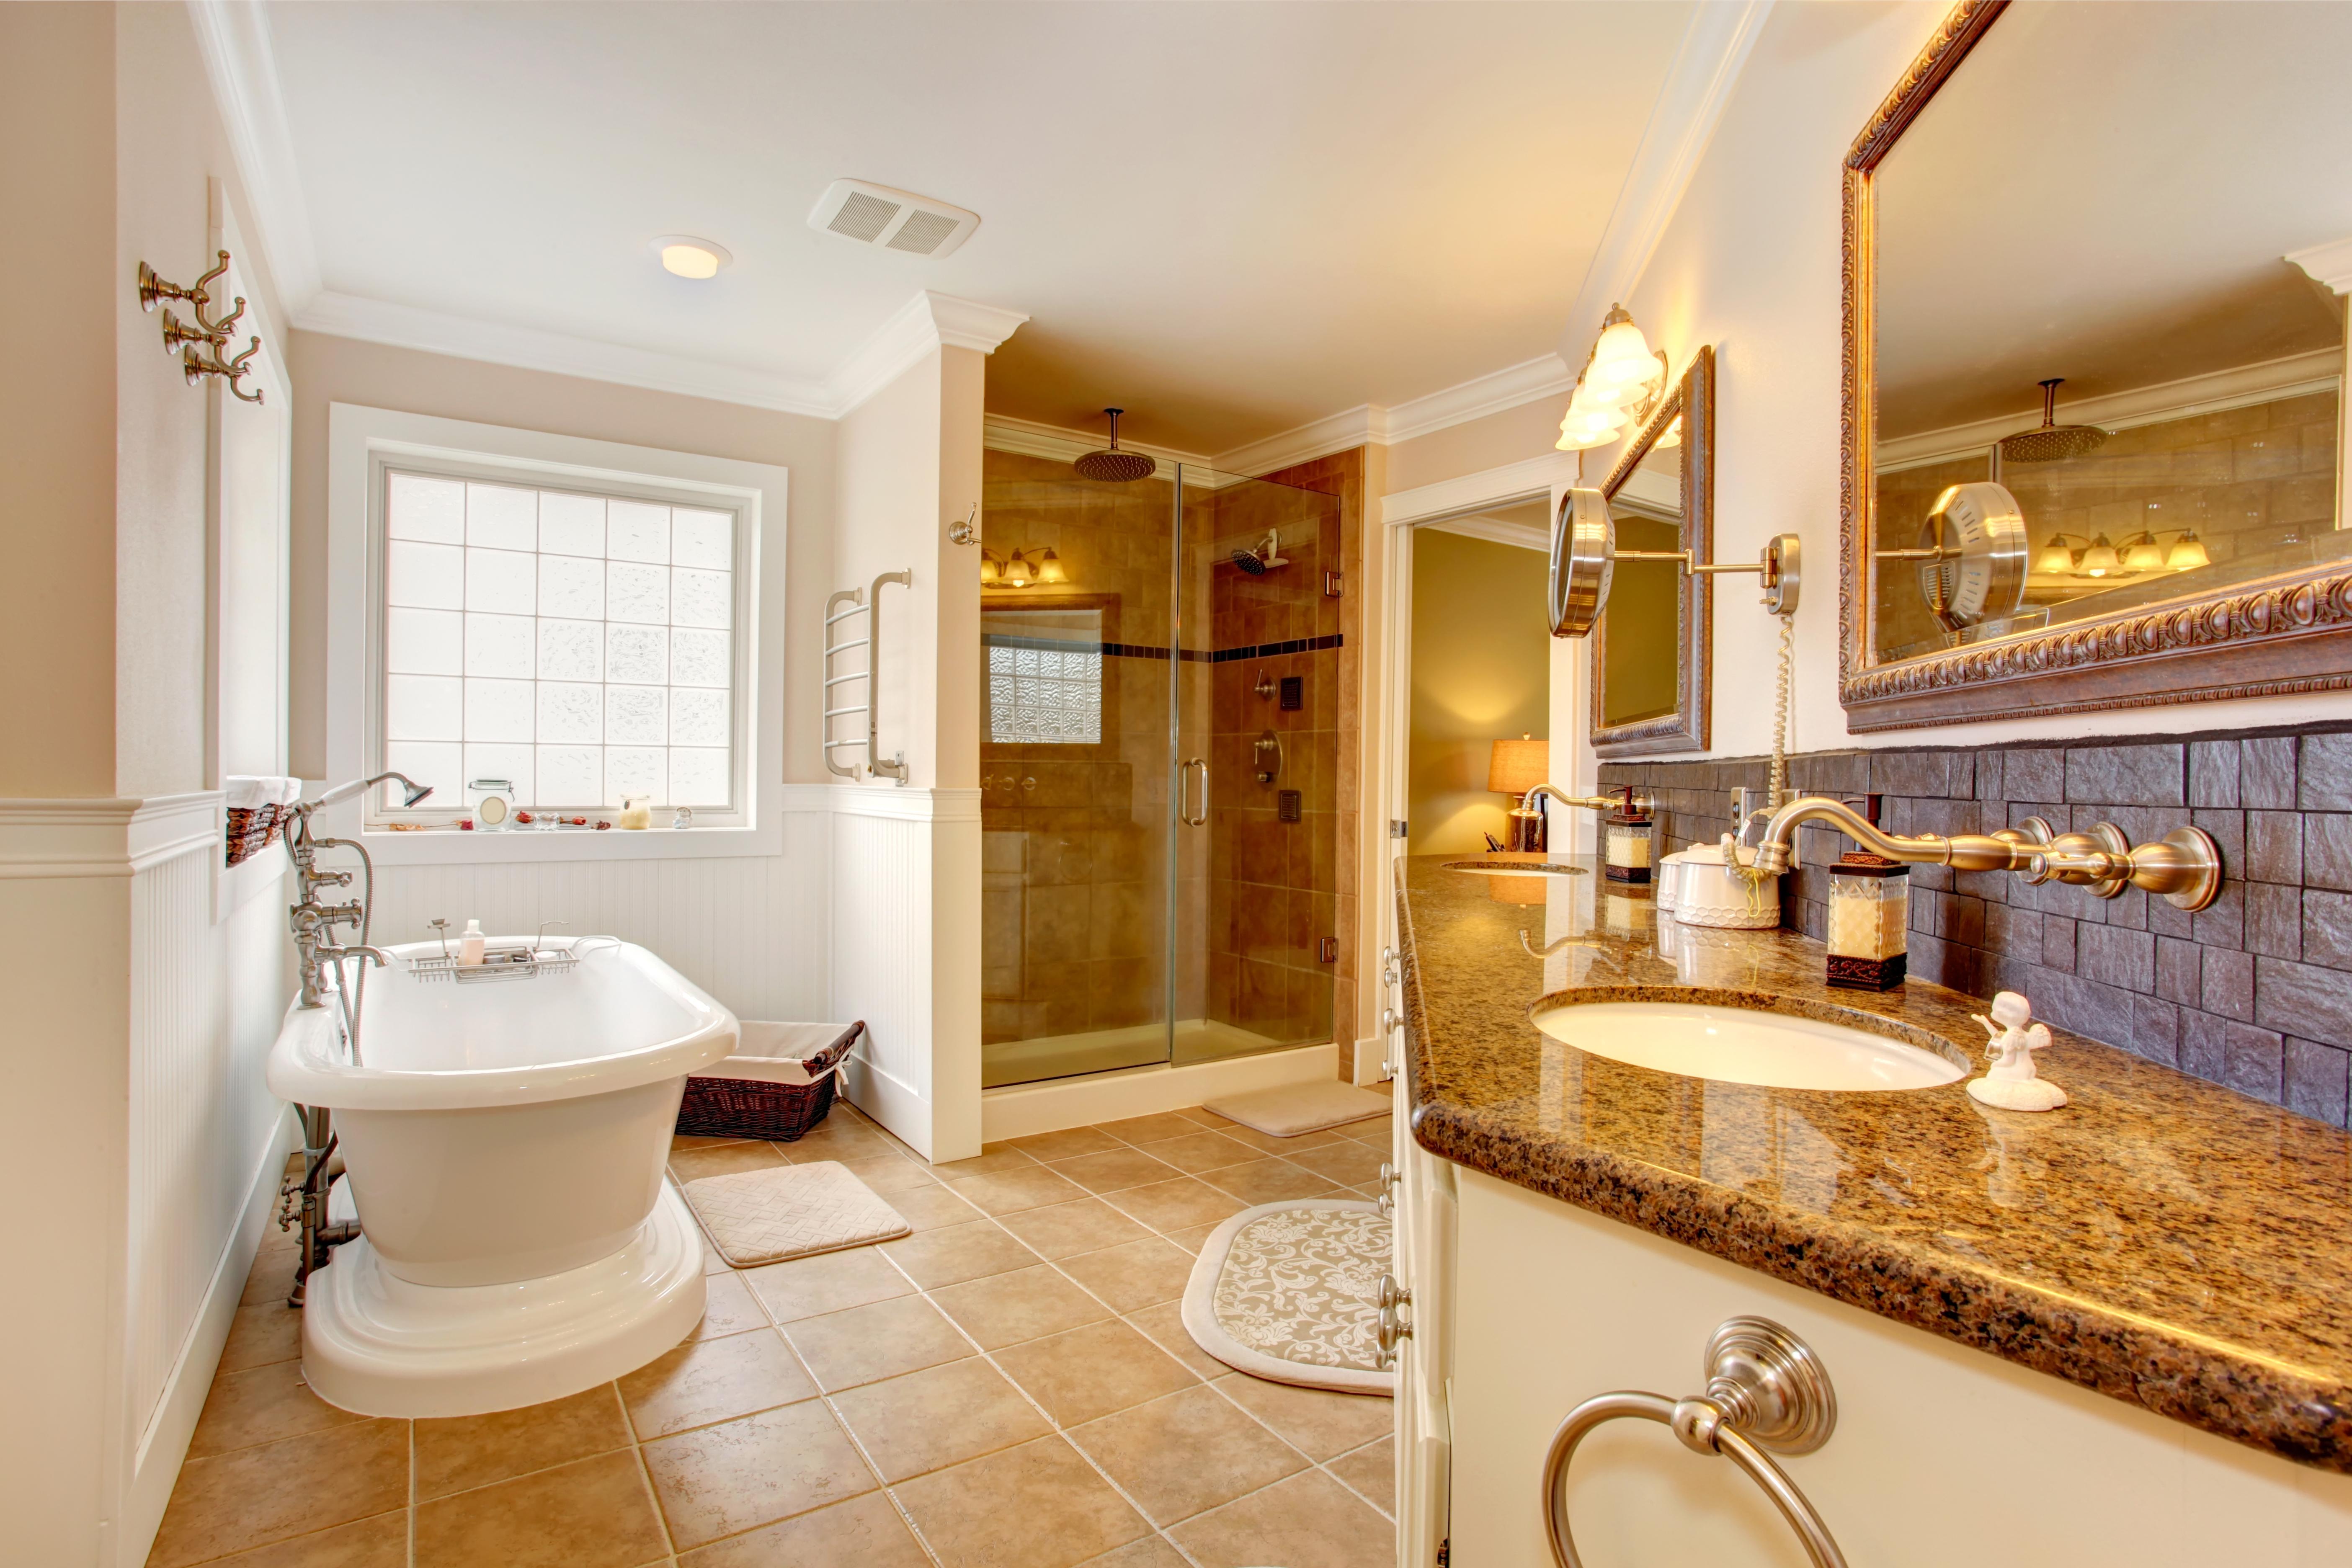 bigstock-Luxury-Bathroom-Interior--77492642